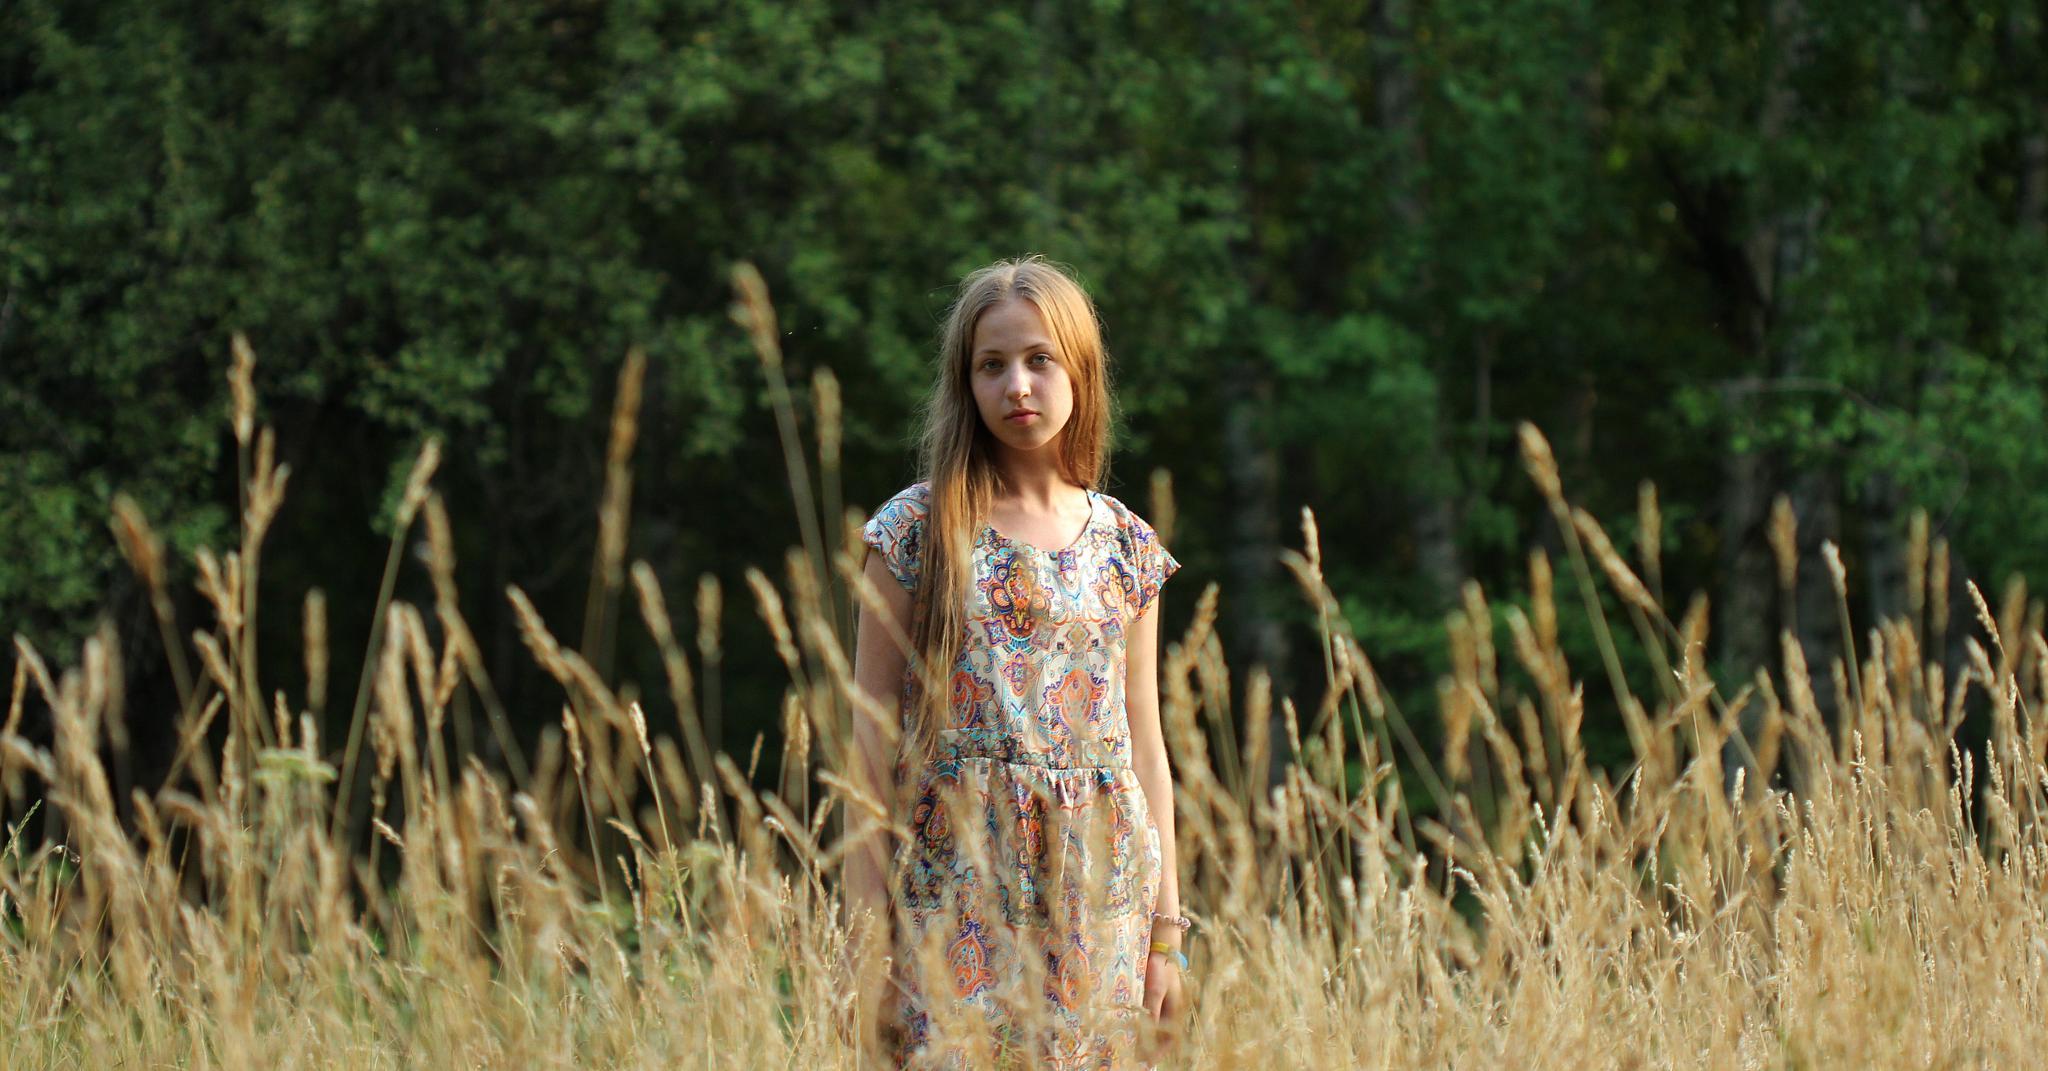 Portrait in field by Pasha Korzh